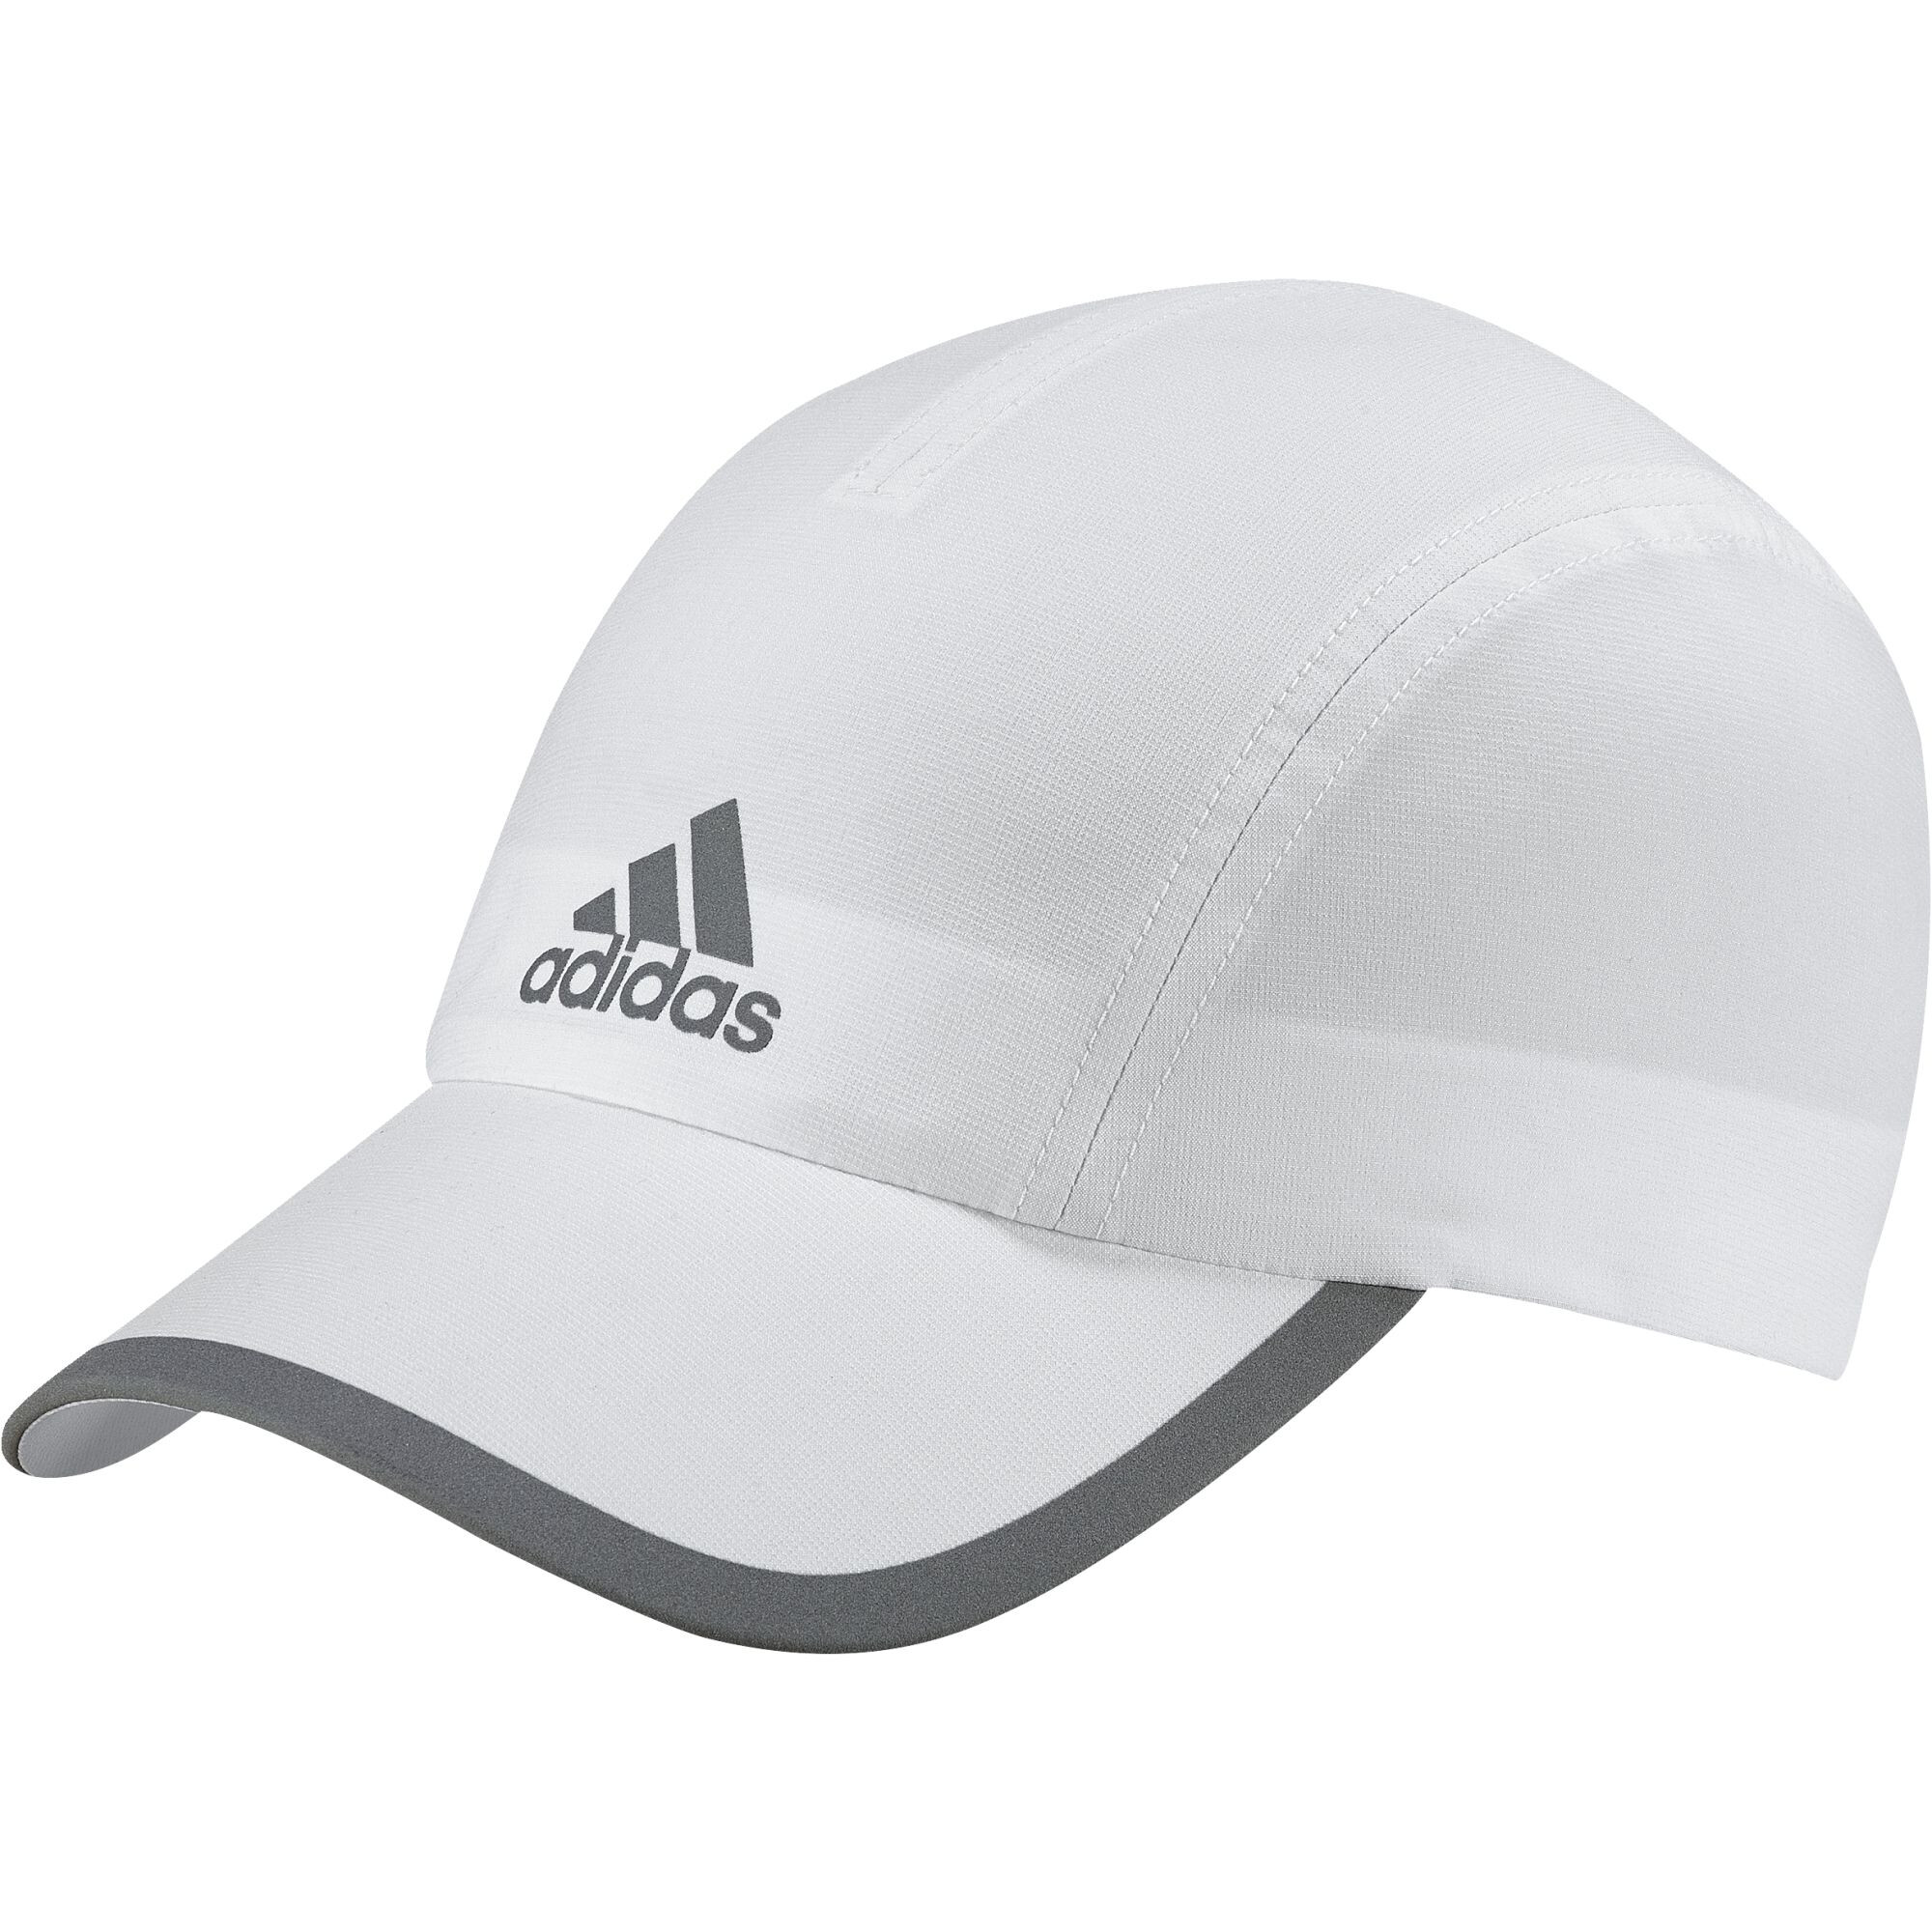 adidas_R96_CL_Cap_white_white_reflective_silver.jpg